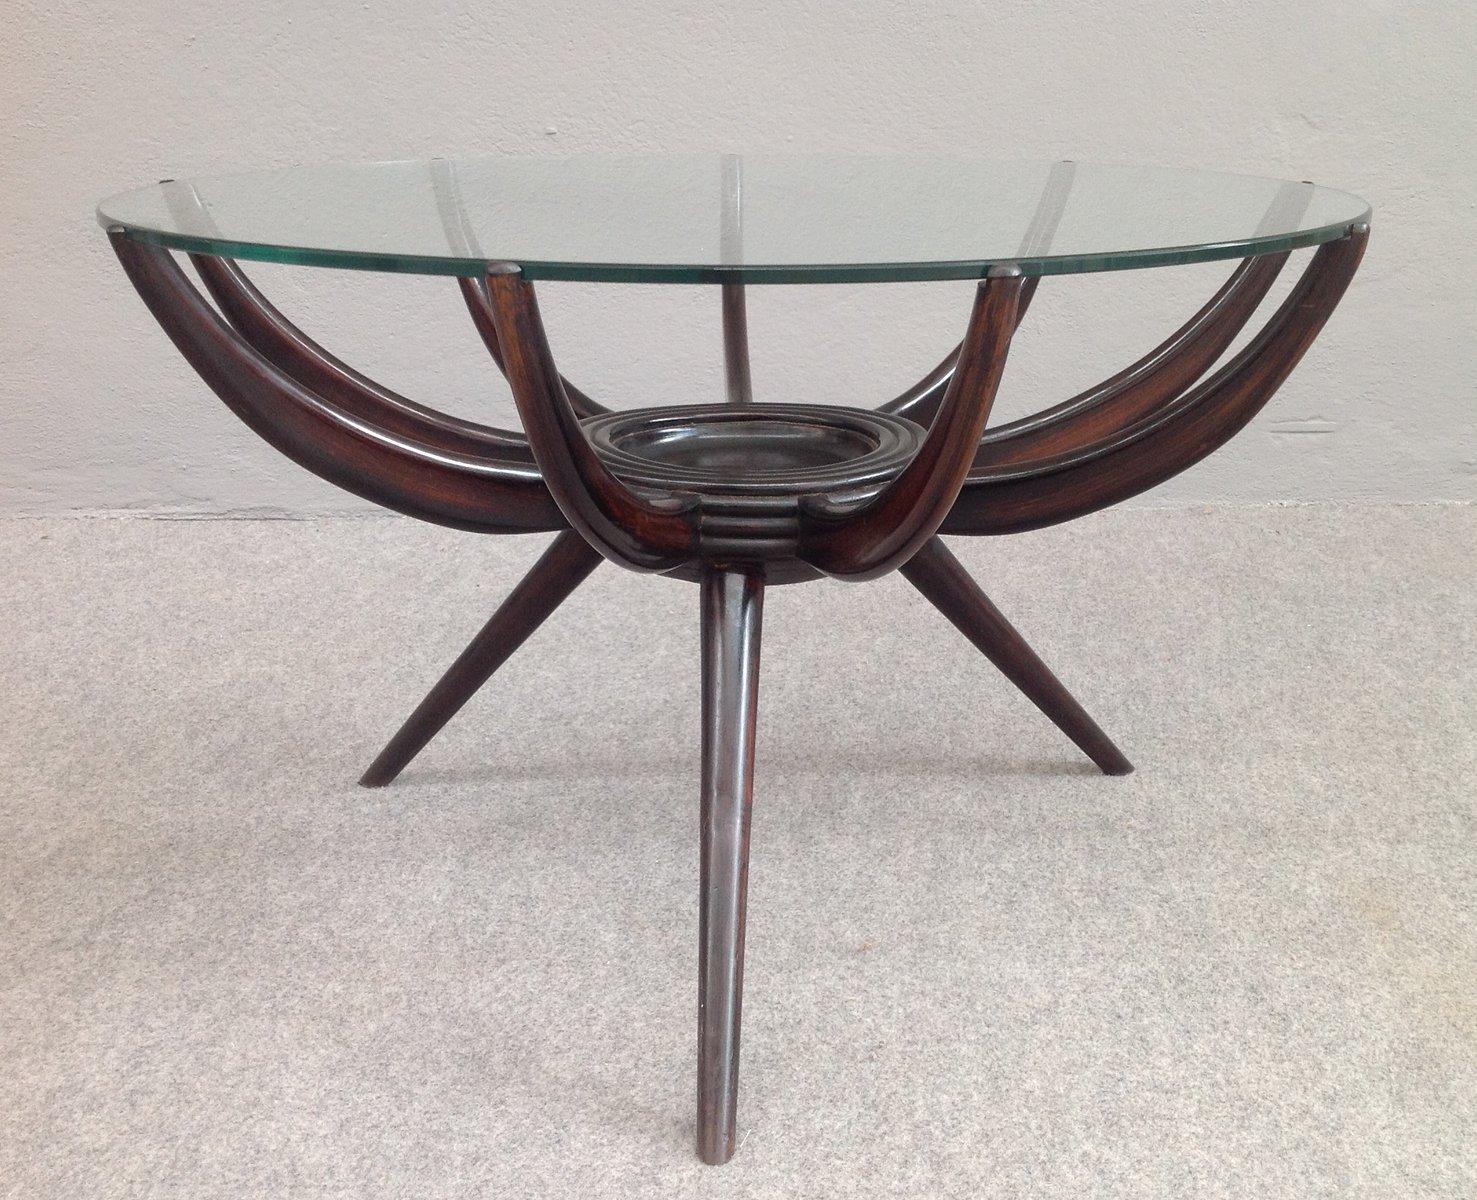 Italian Coffee Table Italian Coffee Table By Carlo De Carli 1950s For Sale At Pamono